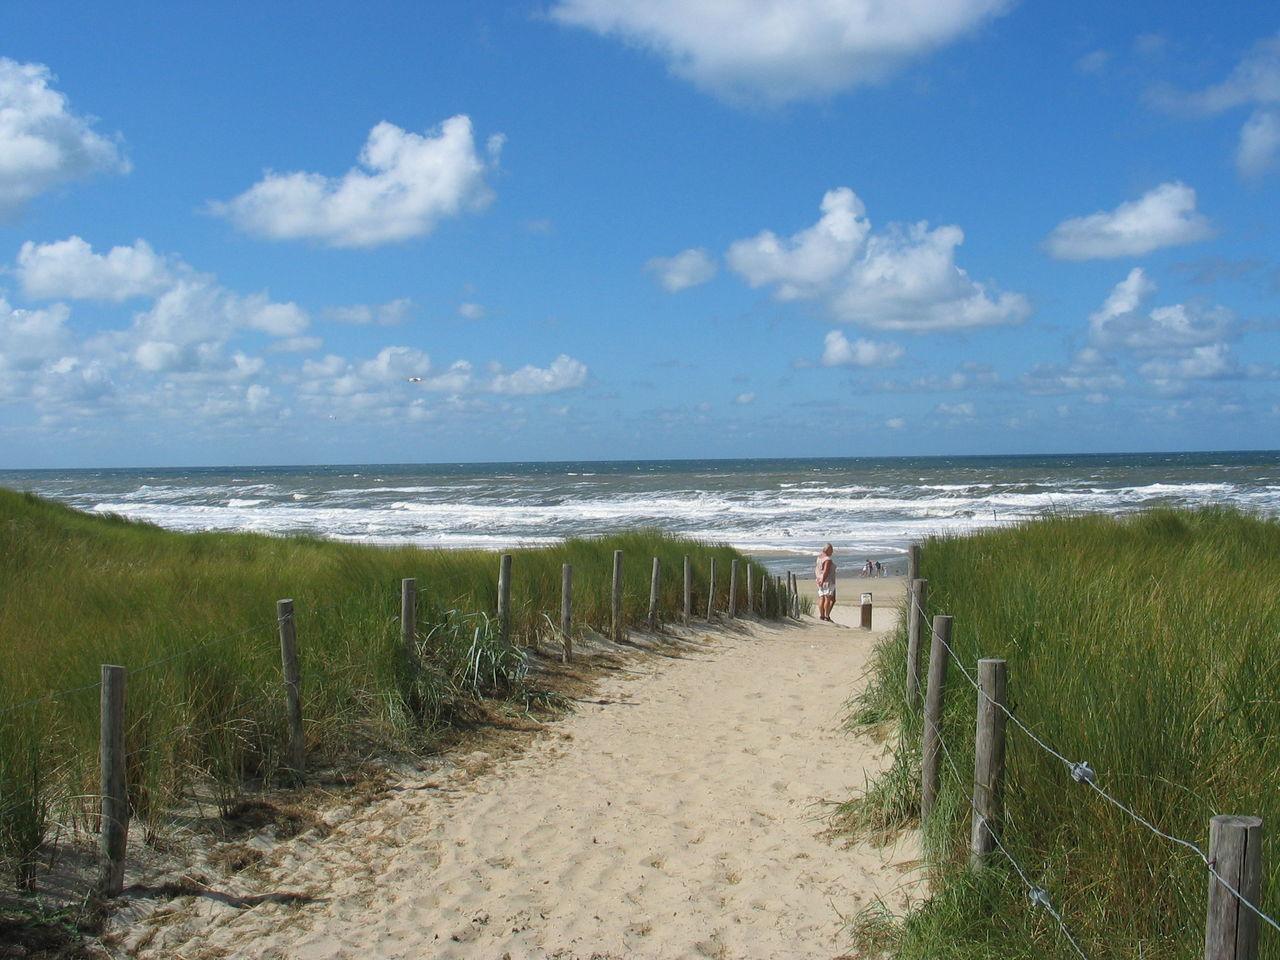 Egmond Noord Holland Sea Coast Meer Kpste Strand Sand Wasser Himmel Sky Dunes Dünen Path Weg Küste Horizon Horizont Breathing Space